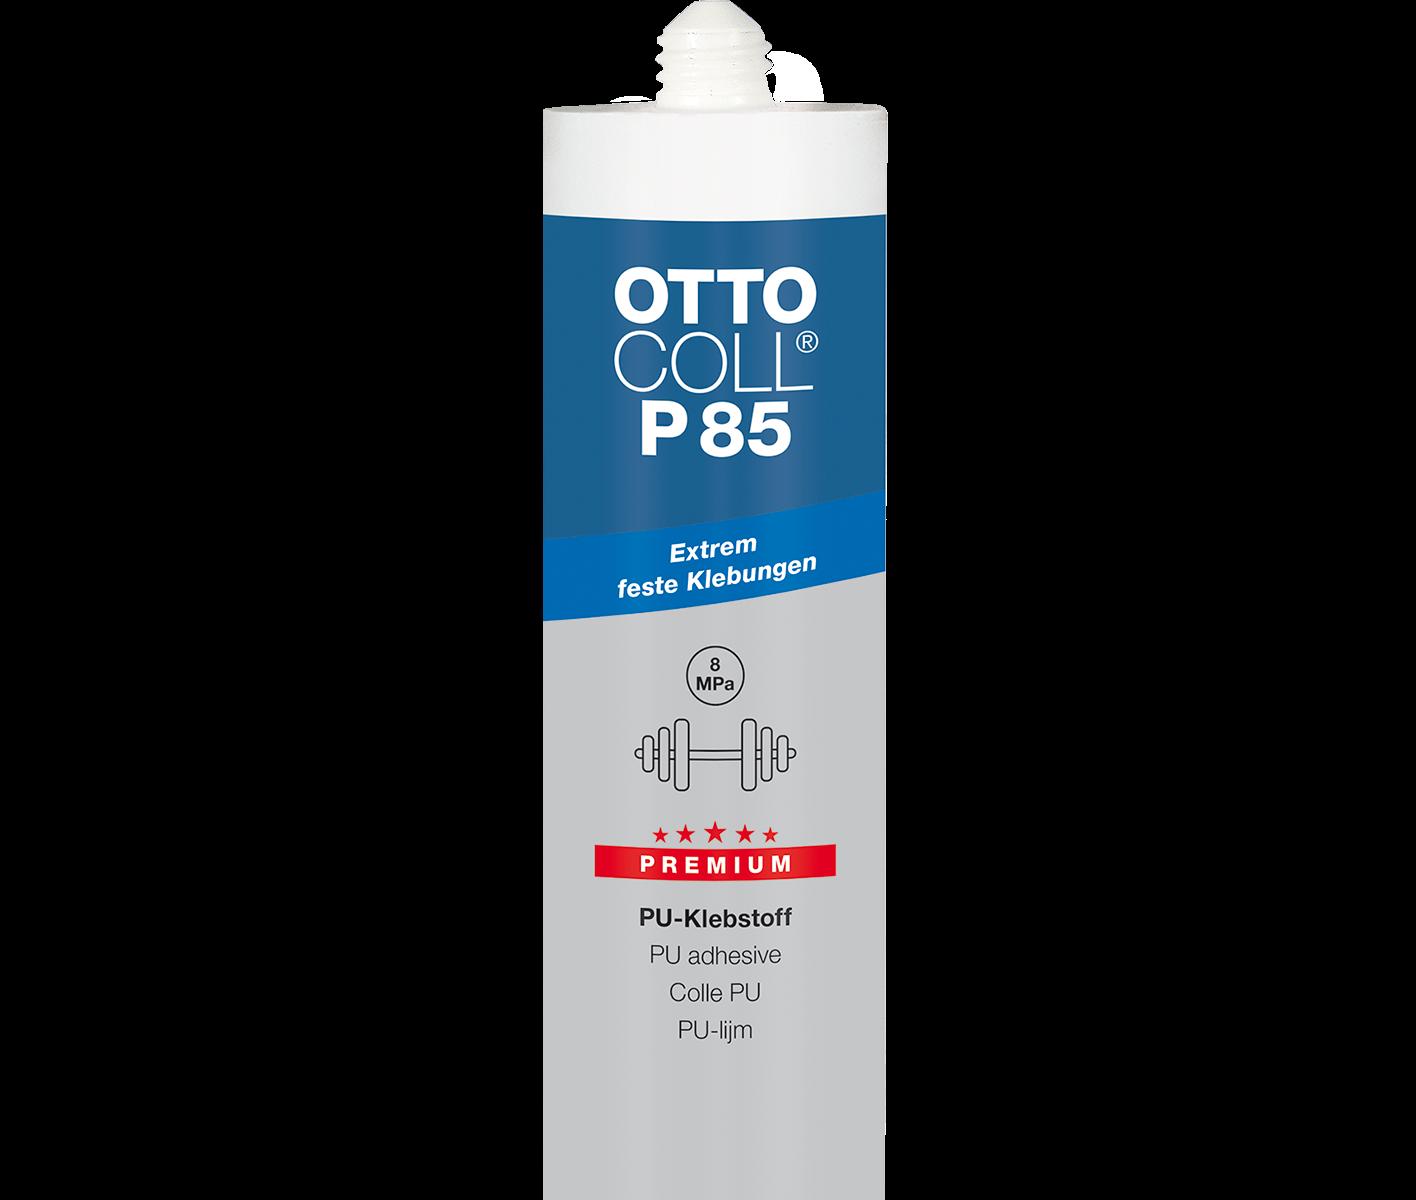 Ottocoll P 85